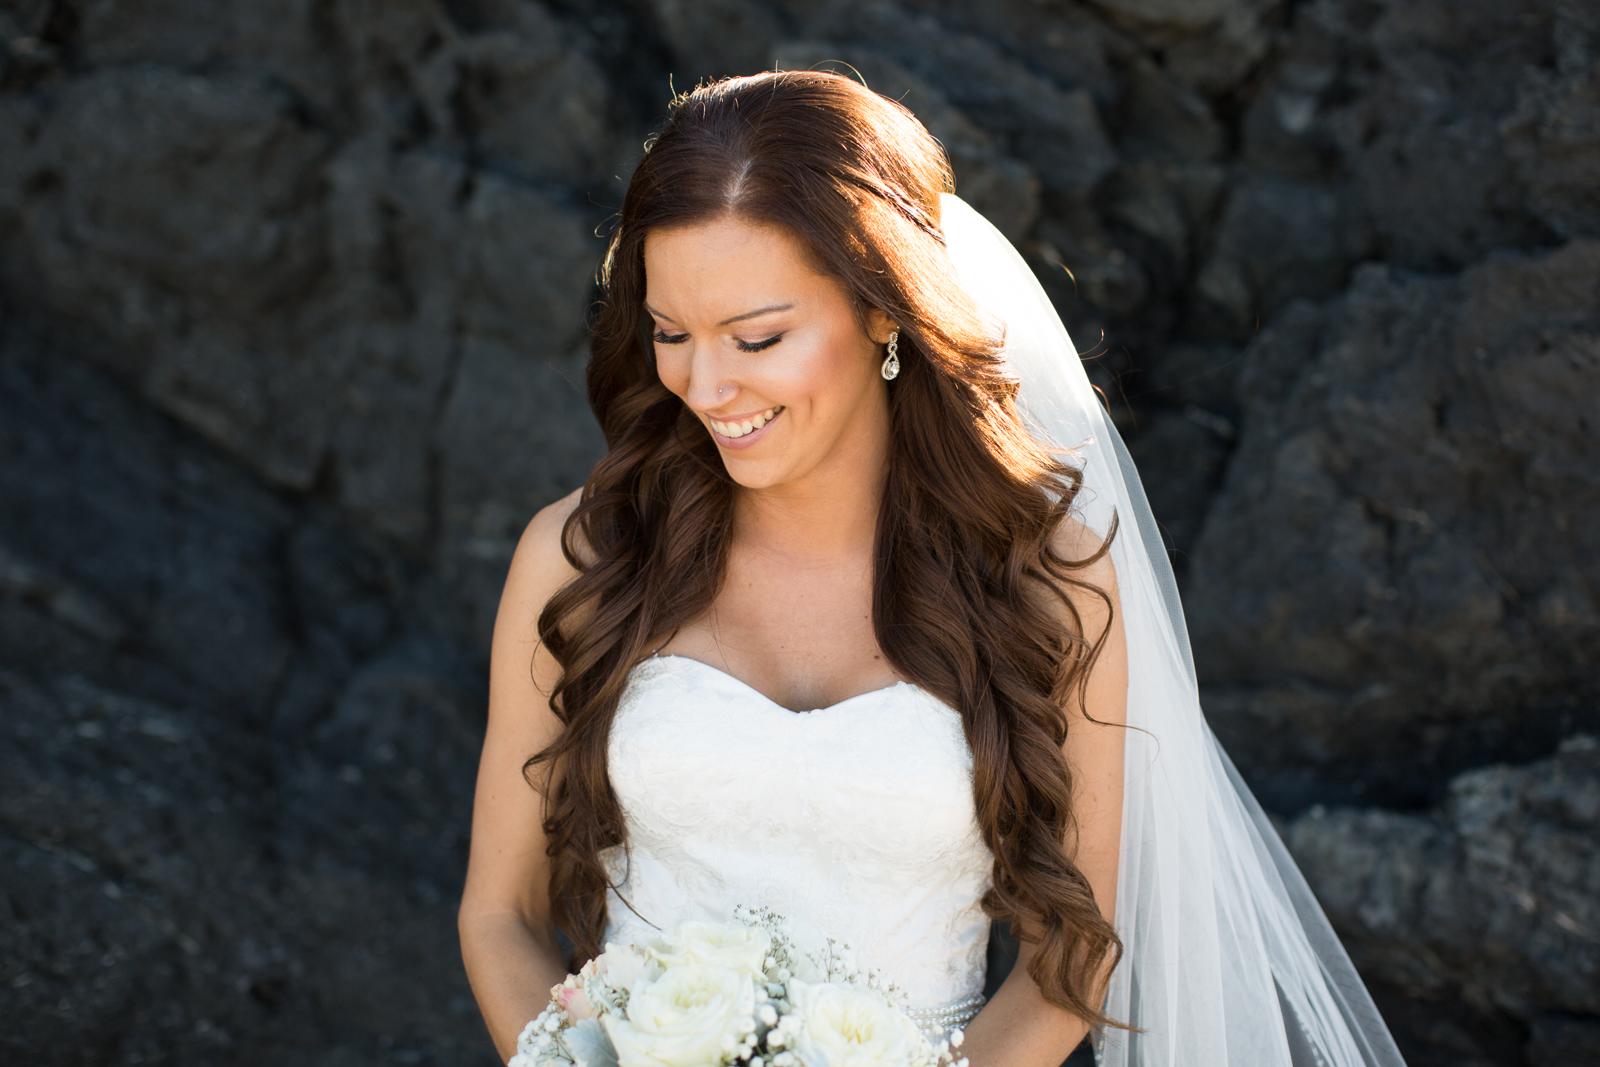 Bec_Kilpatrick_Photography_Angie_and_Steve_ByronBay_Wedding_Portraits-4922